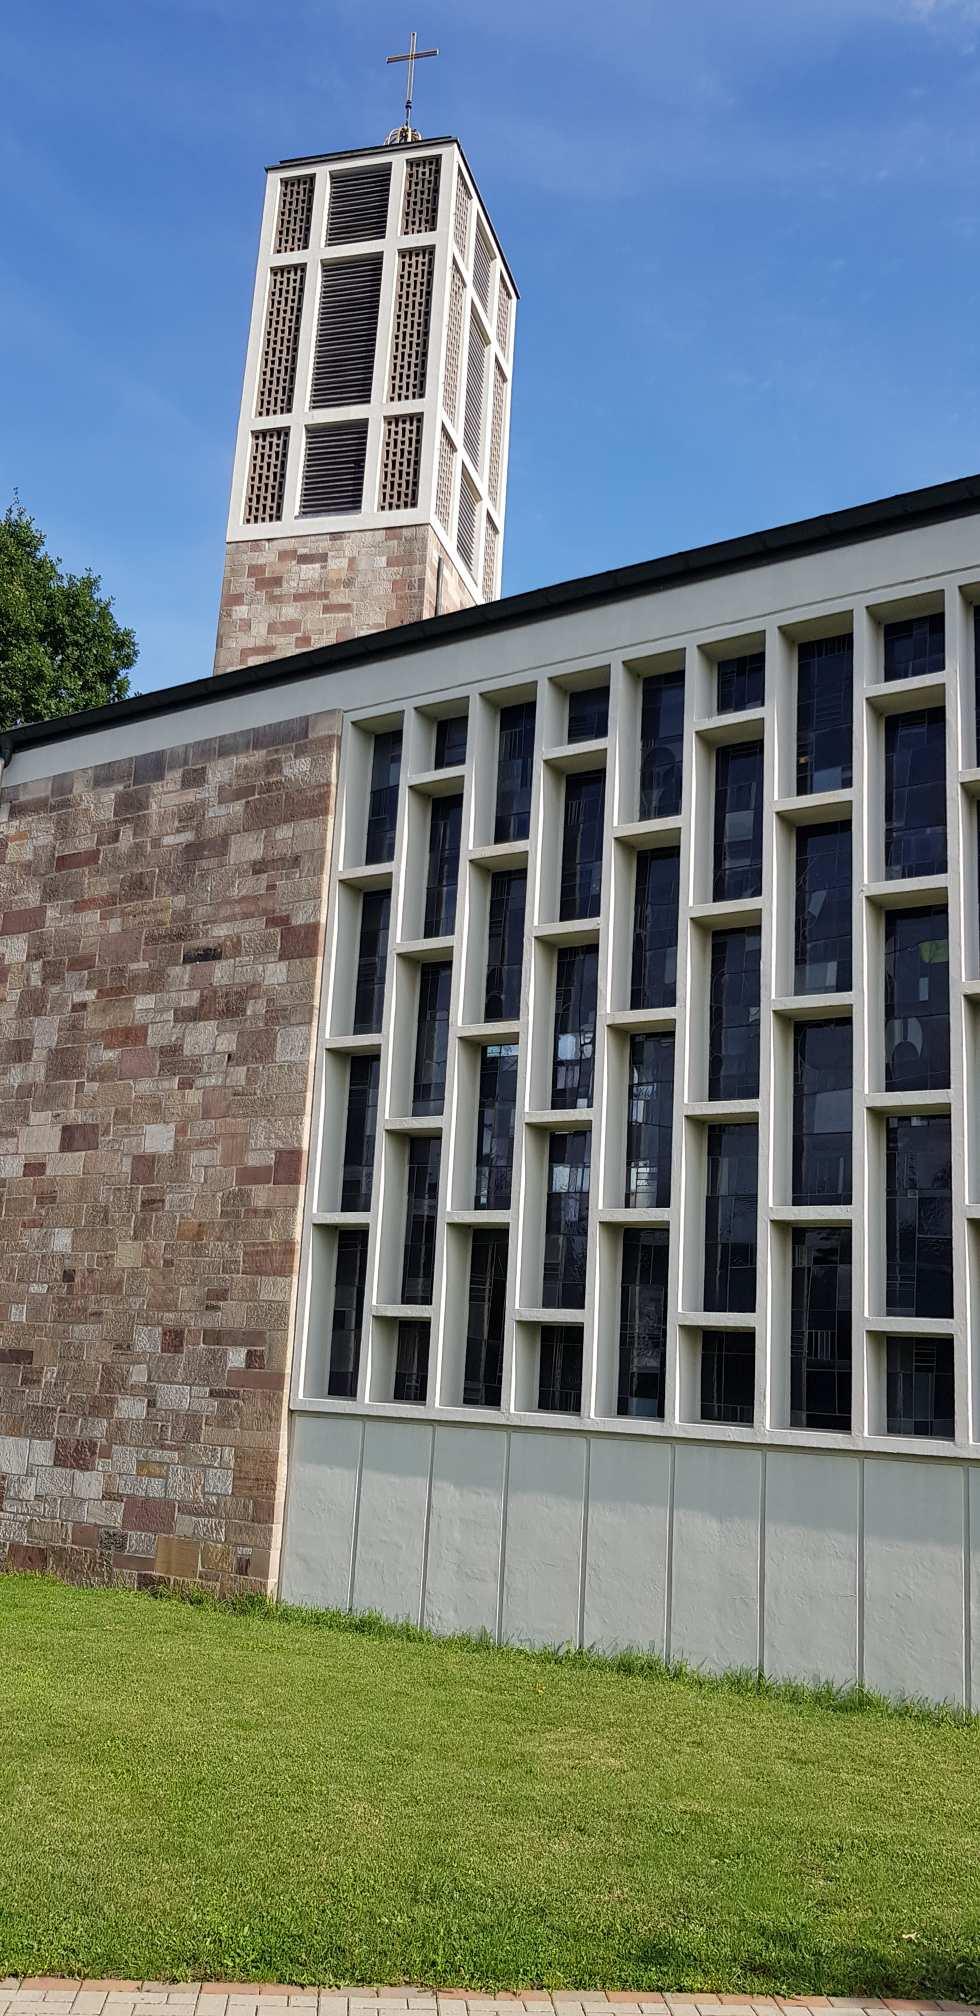 Adventskirche Niedervellmar